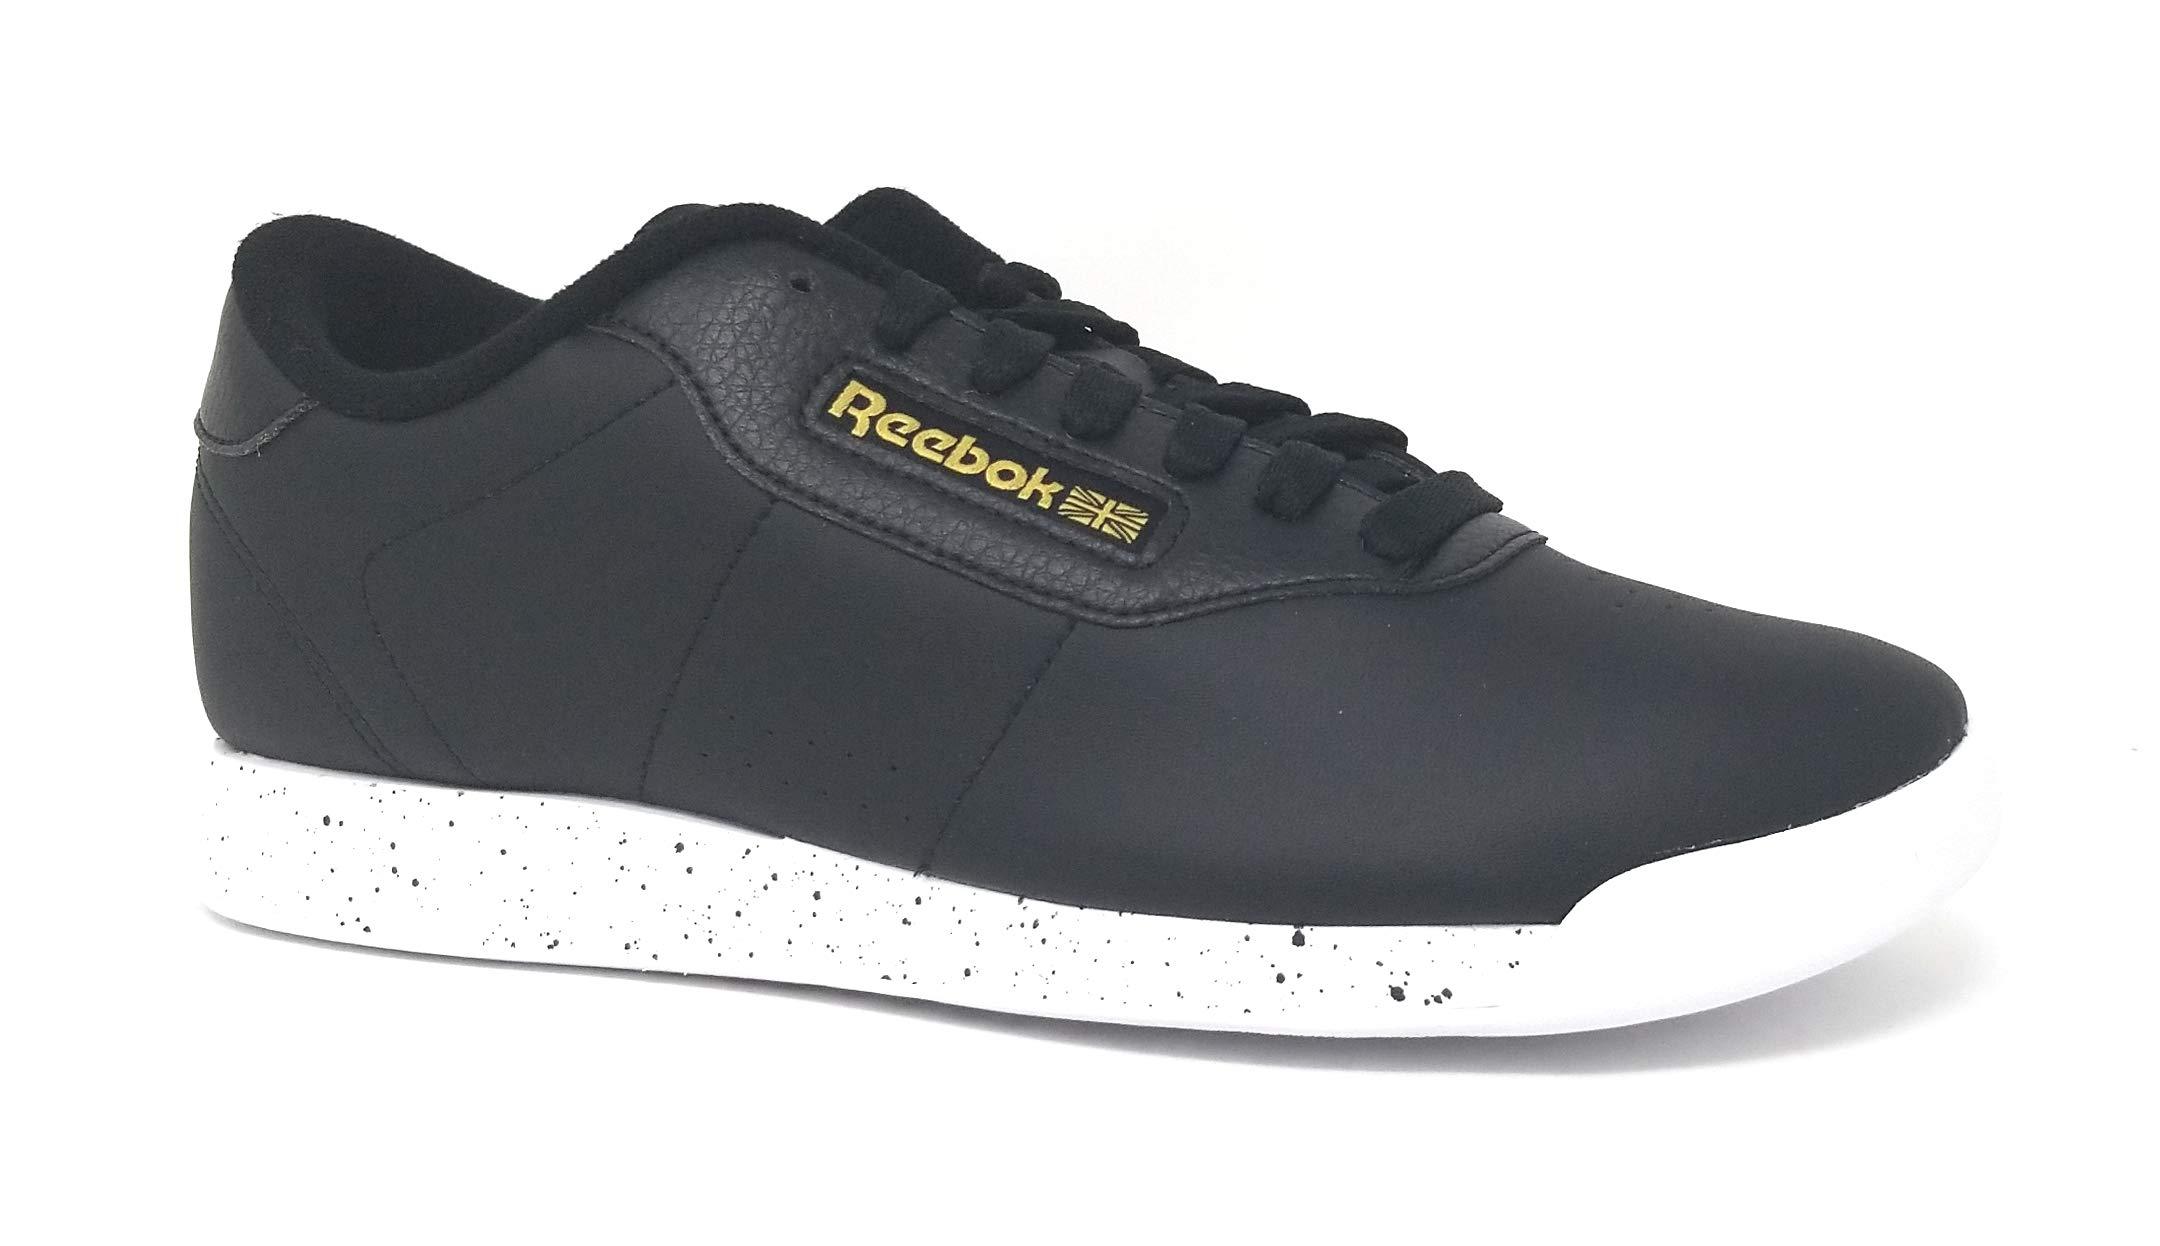 ca02d64a414cf9 Galleon - Reebok Women s Princess Sneaker